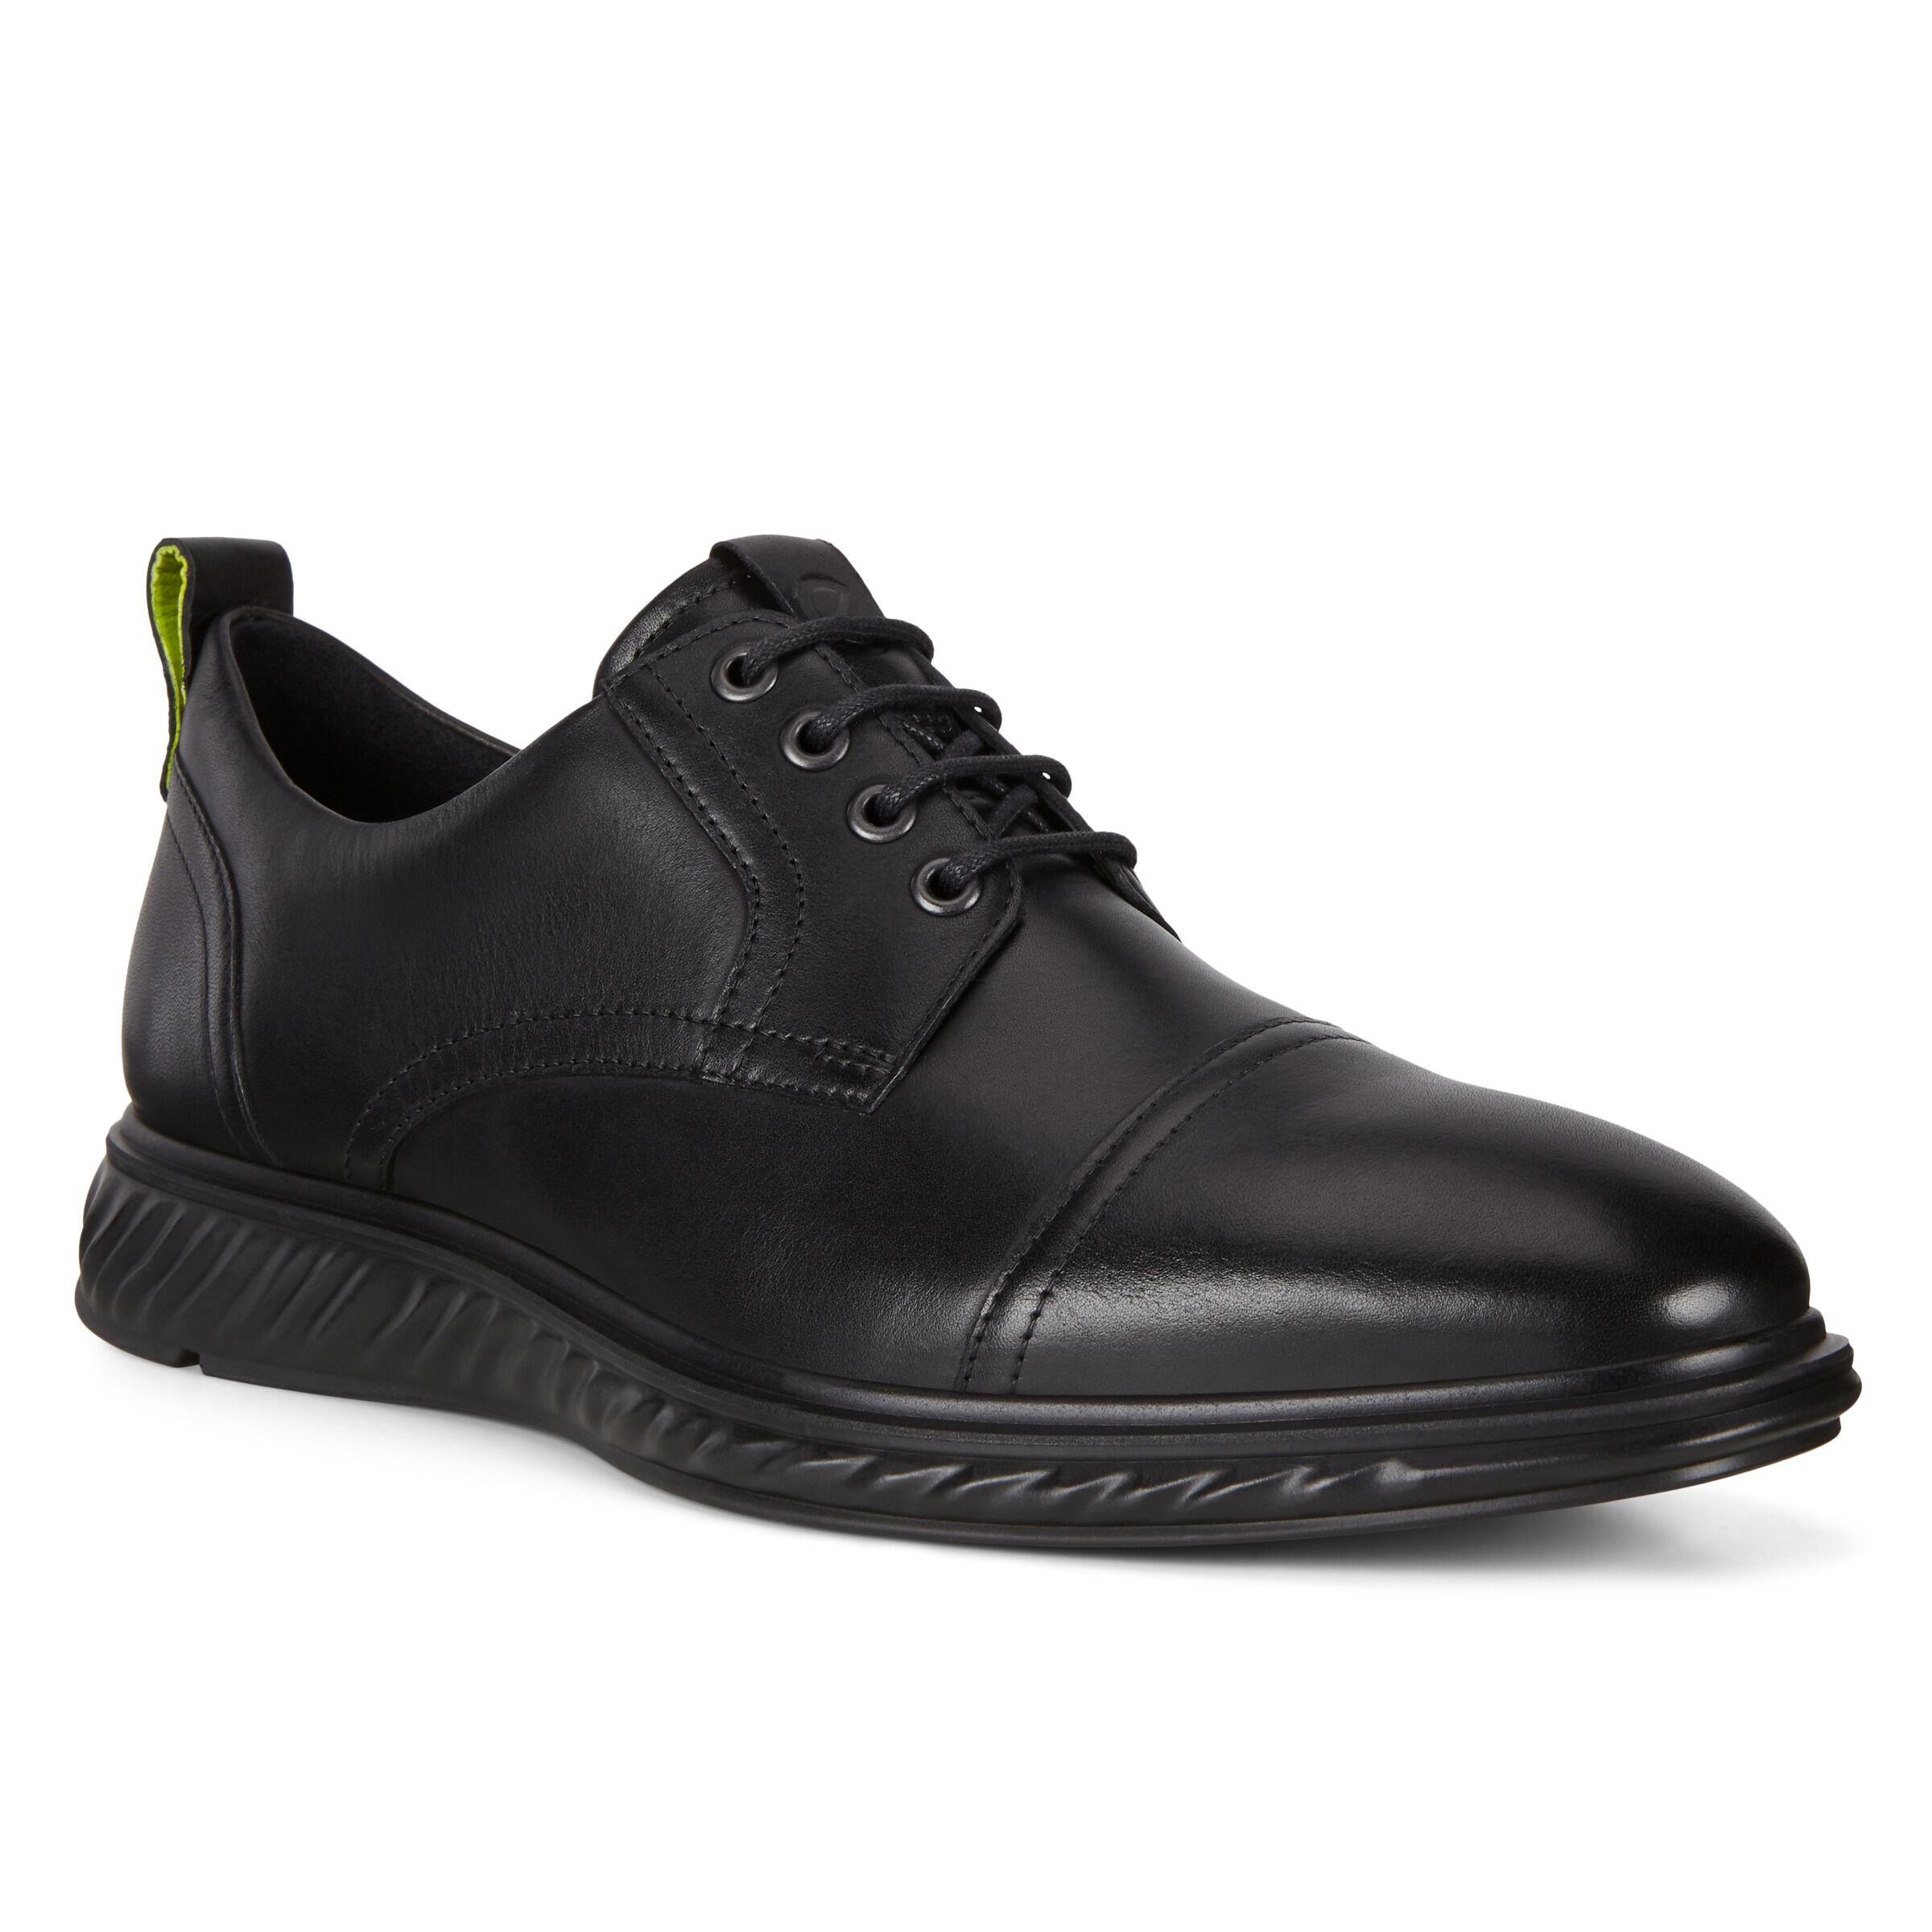 ECCO St. 1 Hybrid Lite Mens Shoes: 12 - Black